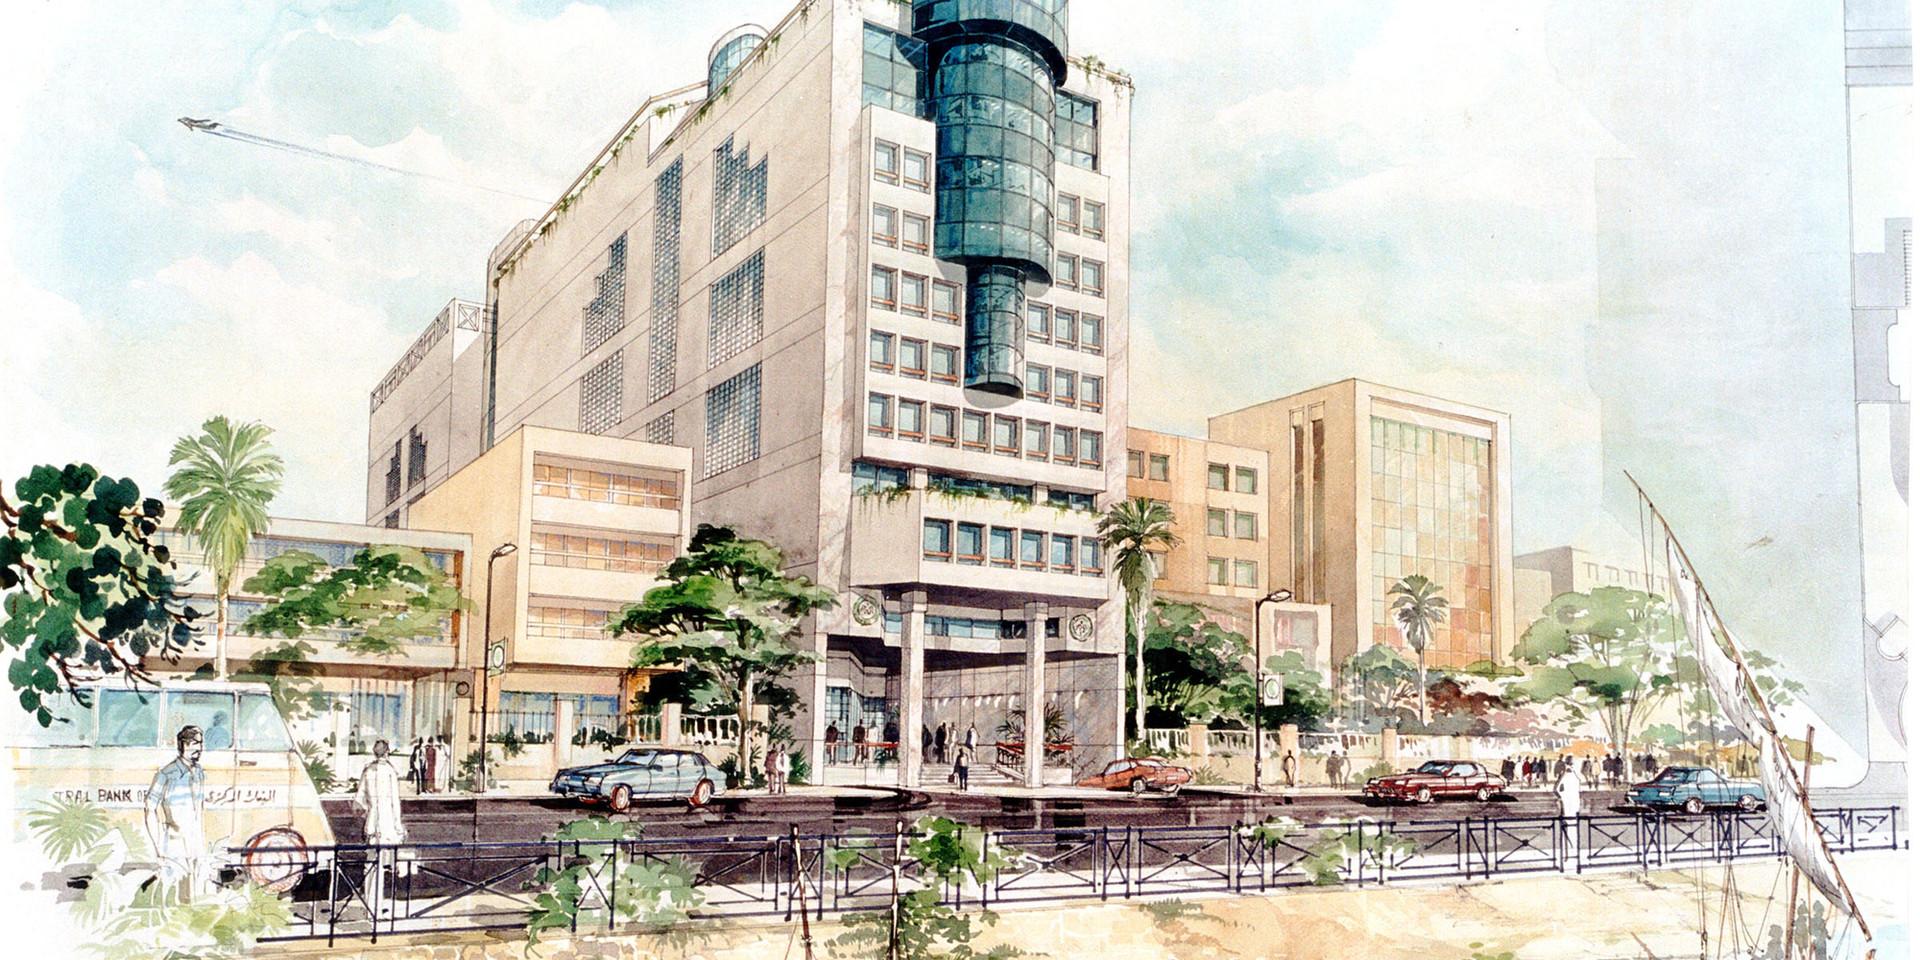 Central Bank of Egypt Rowd el Farag Office Building Watercolor Rendering